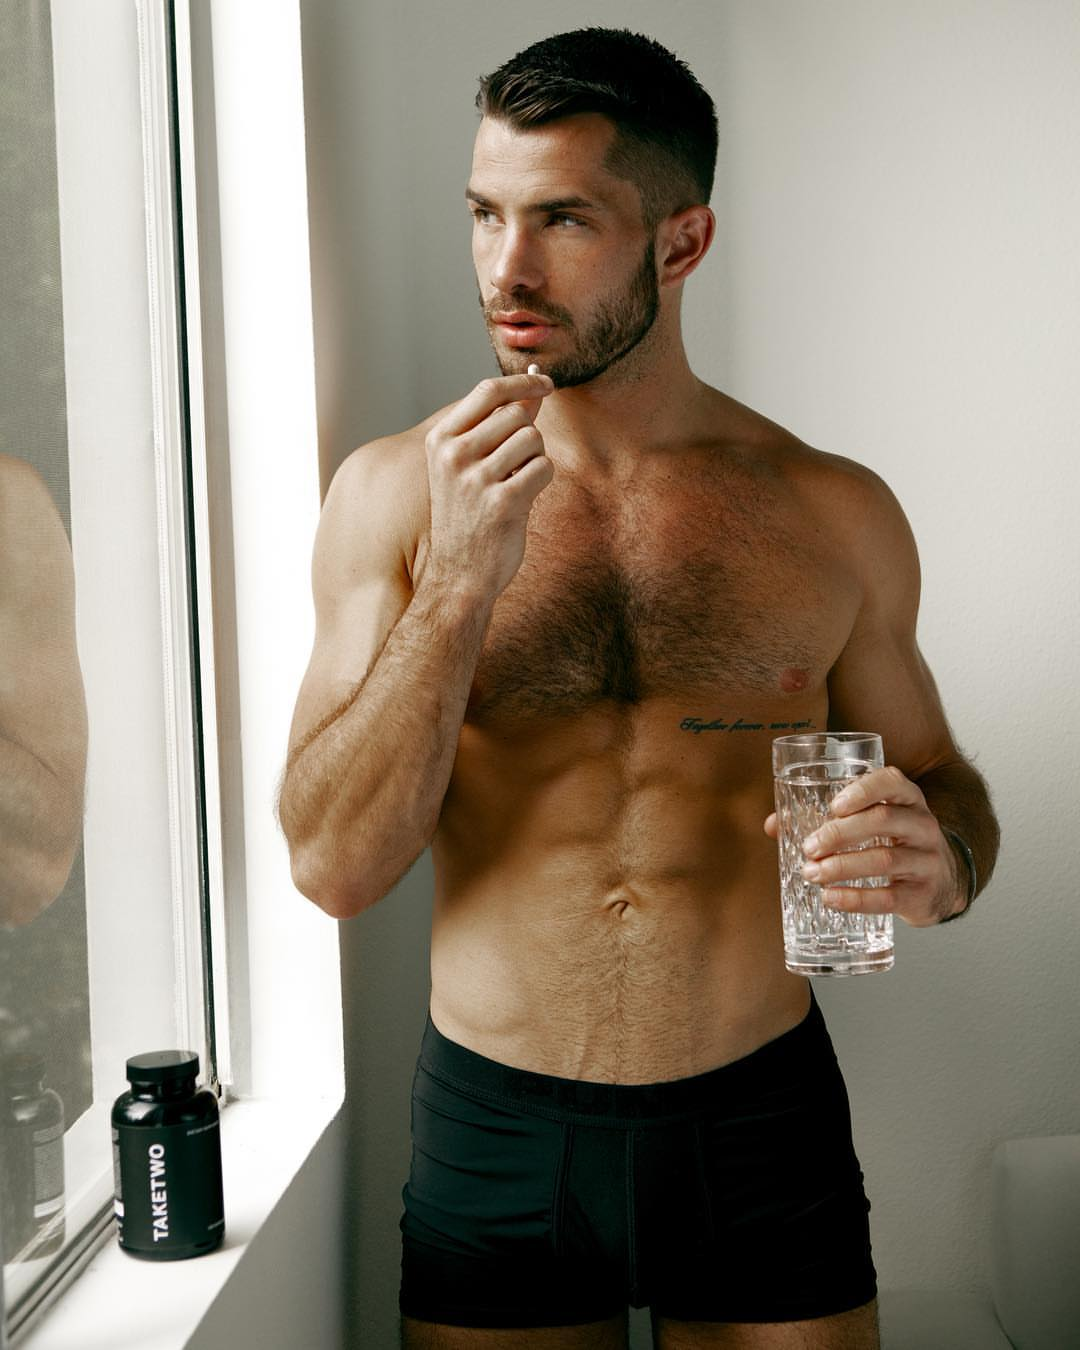 Anthony Pecoraro Porn shirtless men on the blog: anthony pecoraro shirtless